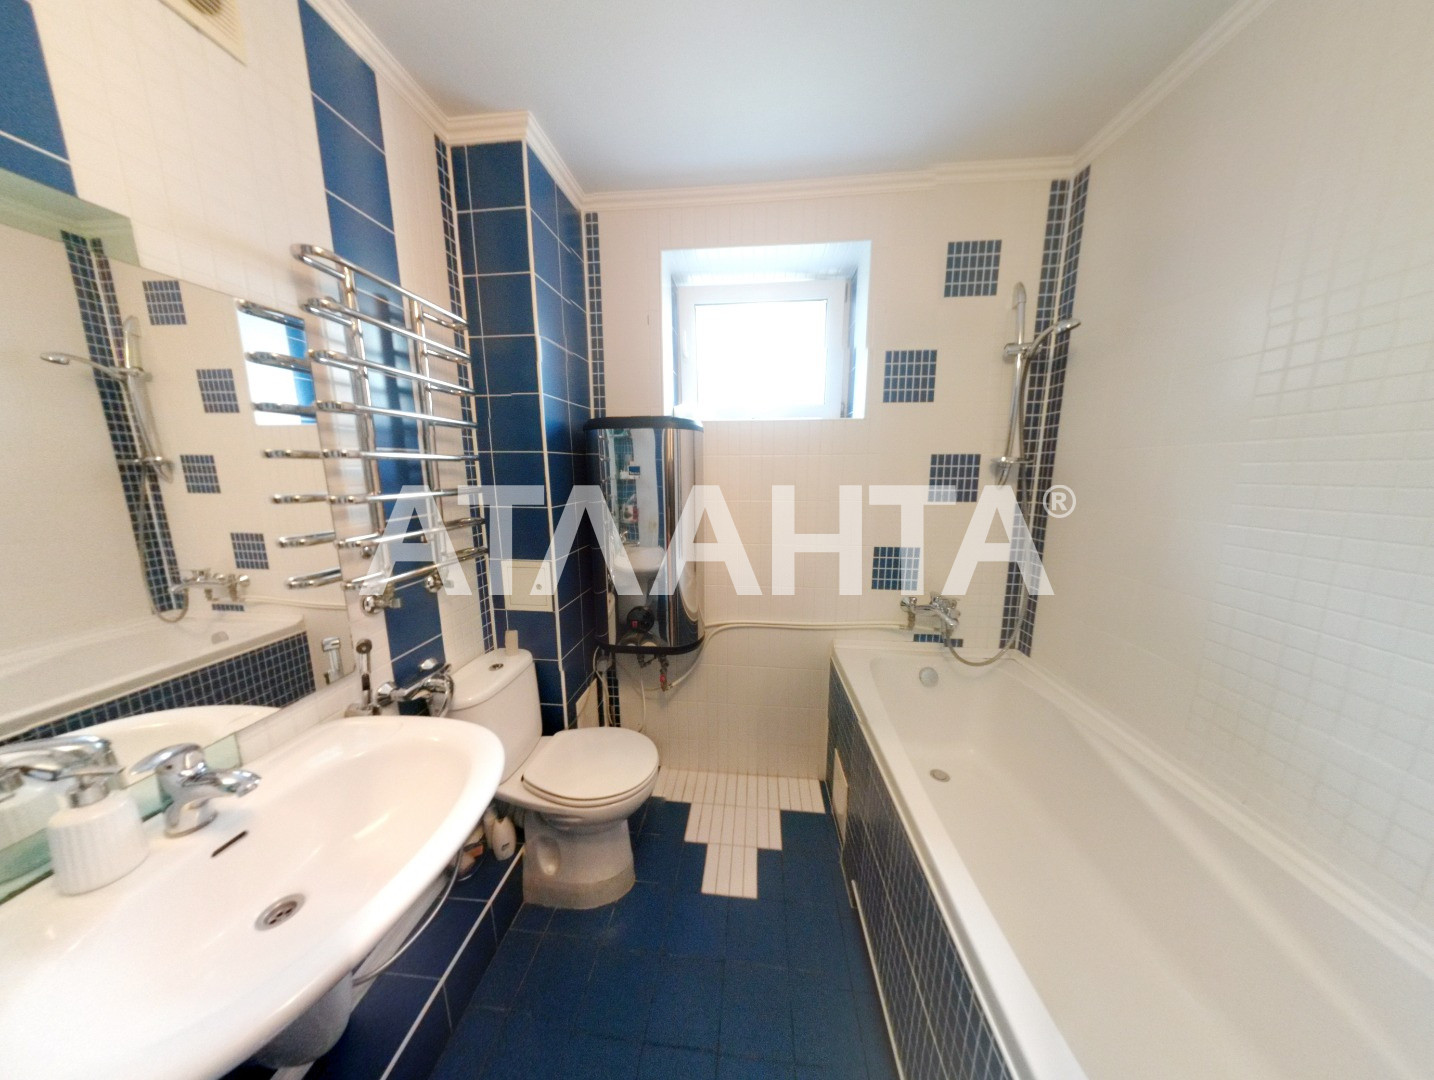 Продается 3-комнатная Квартира на ул. Ул. Ломоносова — 139 600 у.е. (фото №11)